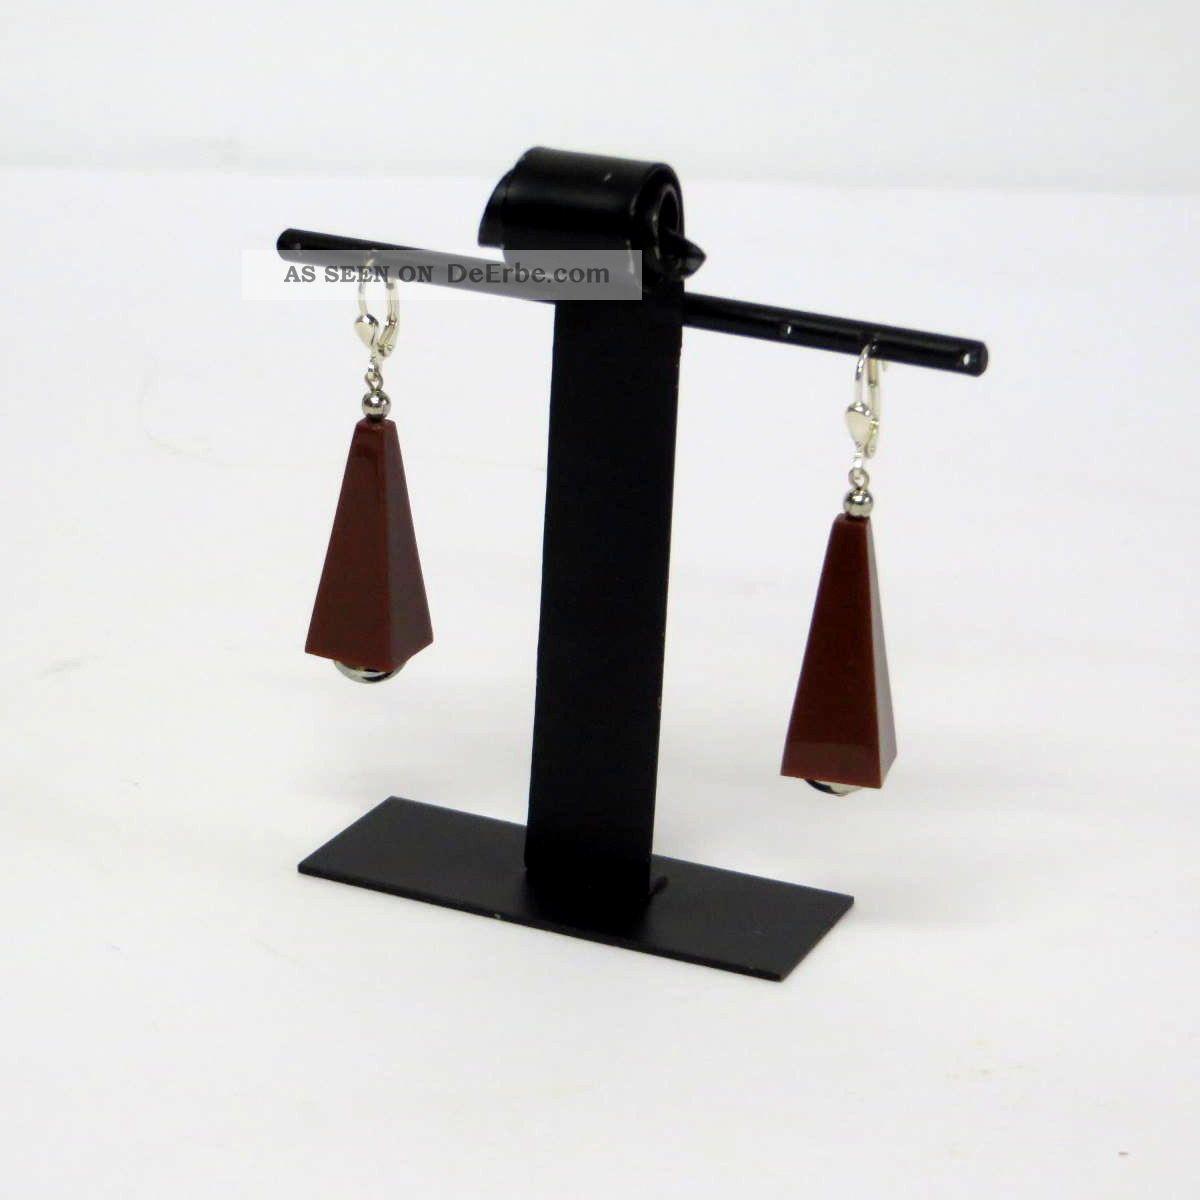 Paar Braune Jakob Bengel Ohrringe/earrings Galalith Art Déco 30er Jahre Schmuck nach Epochen Bild